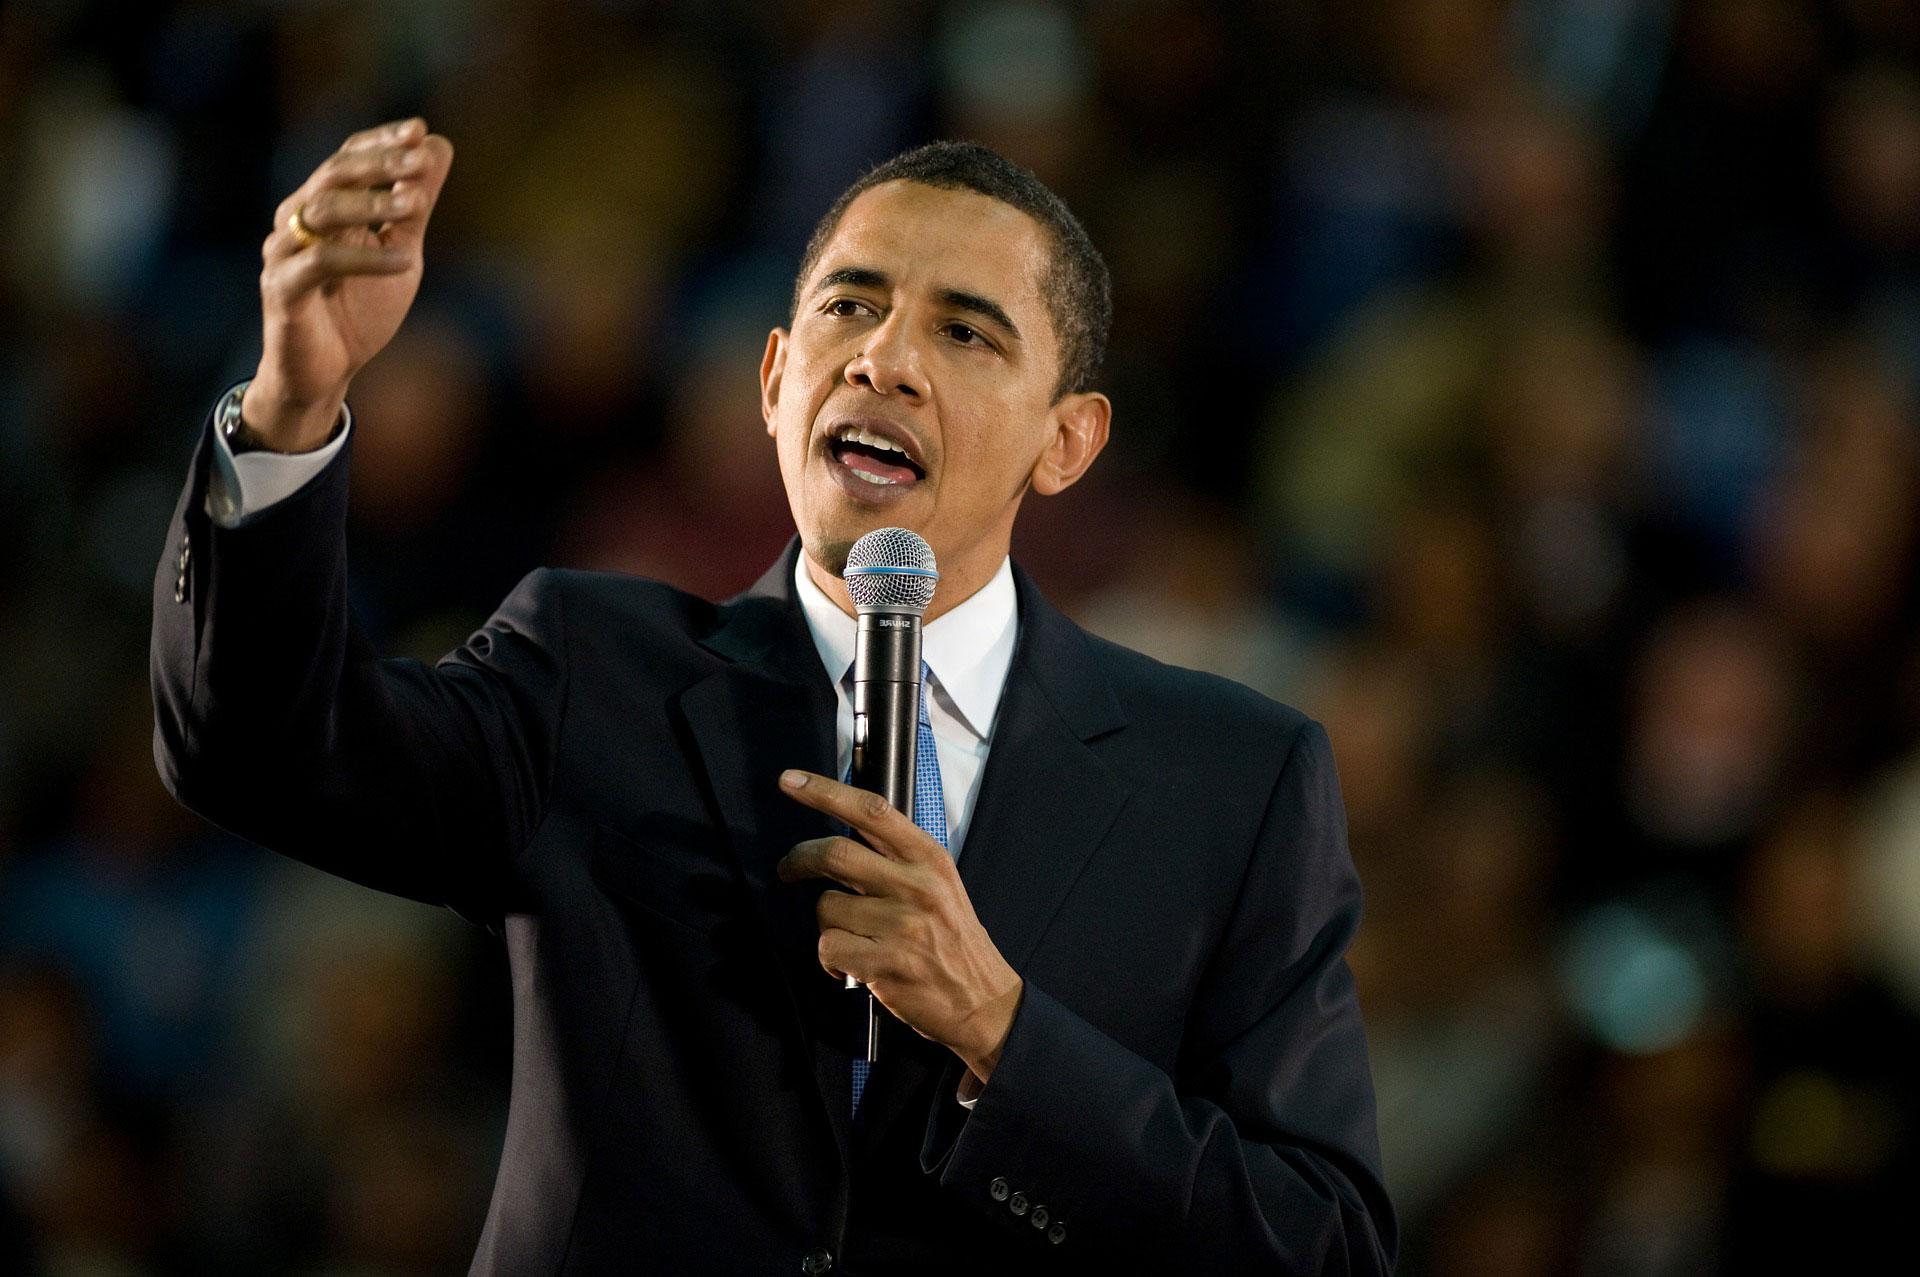 photo of President Obama's US acceptance speech